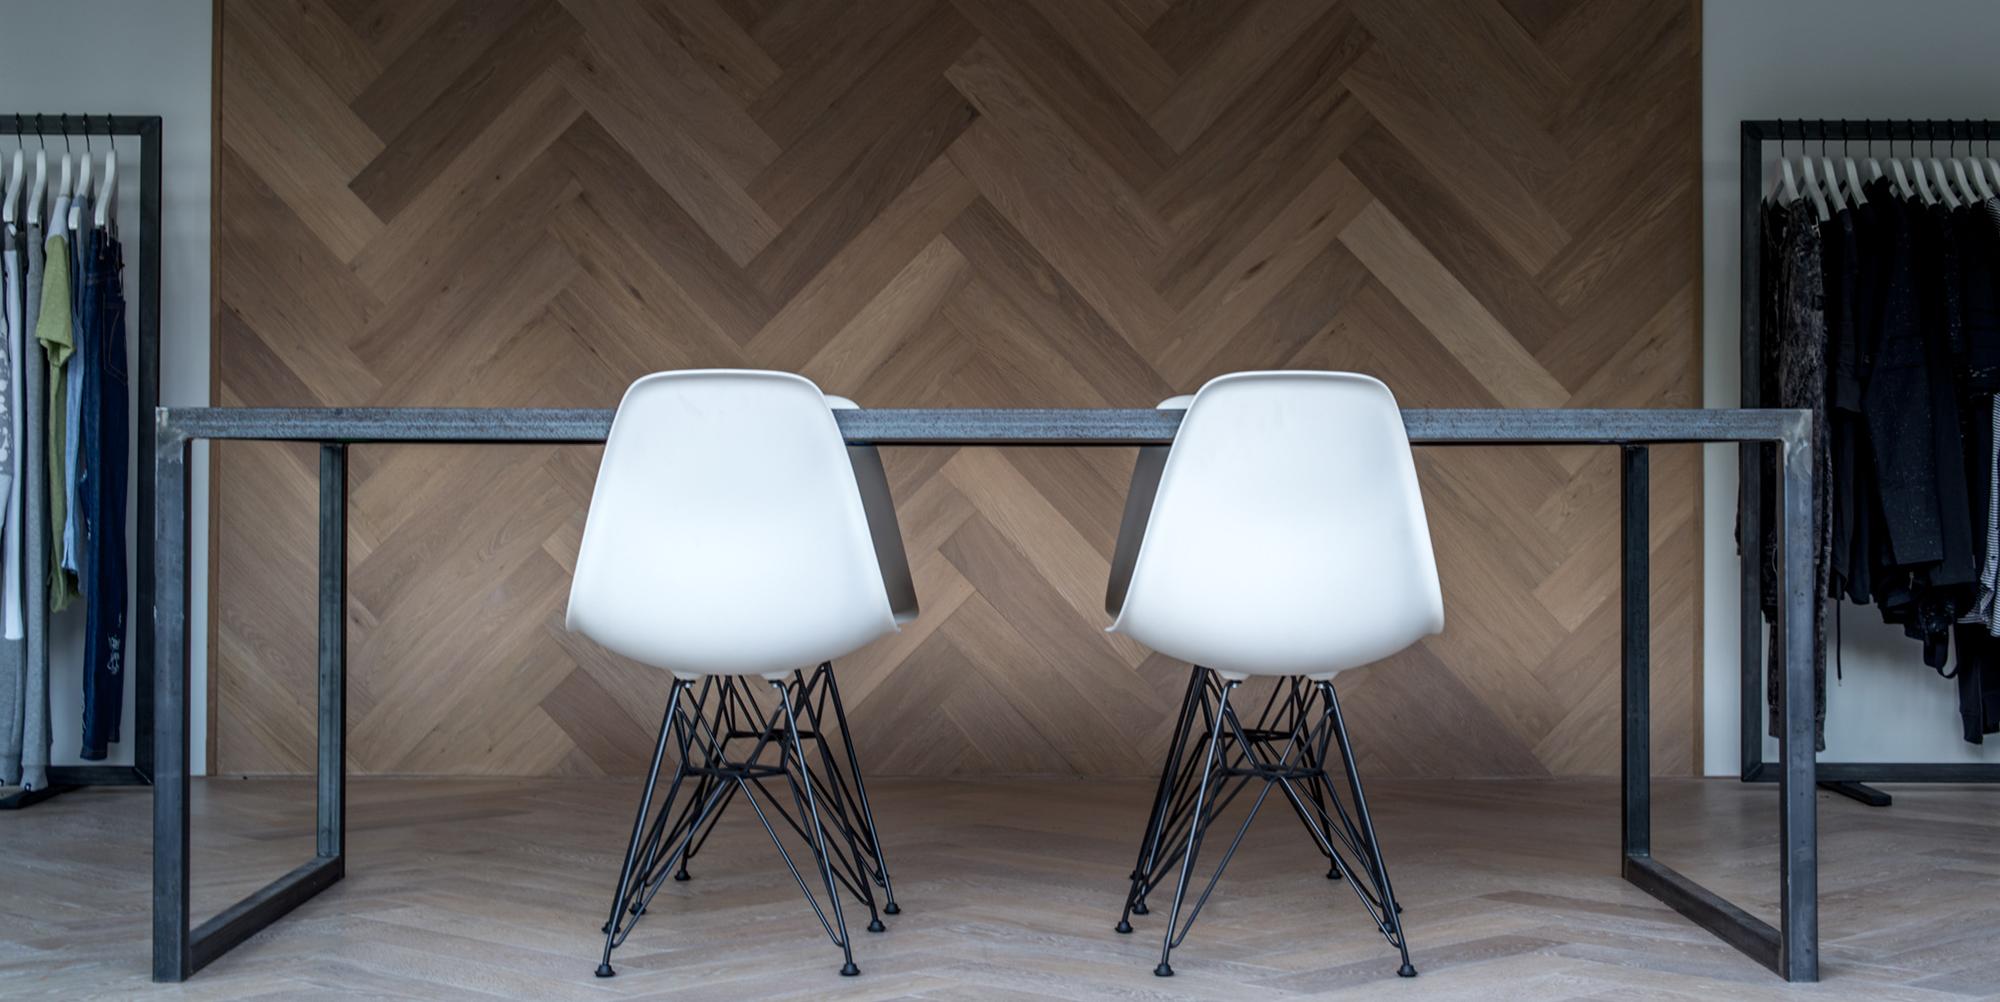 tafel napoli blank staal